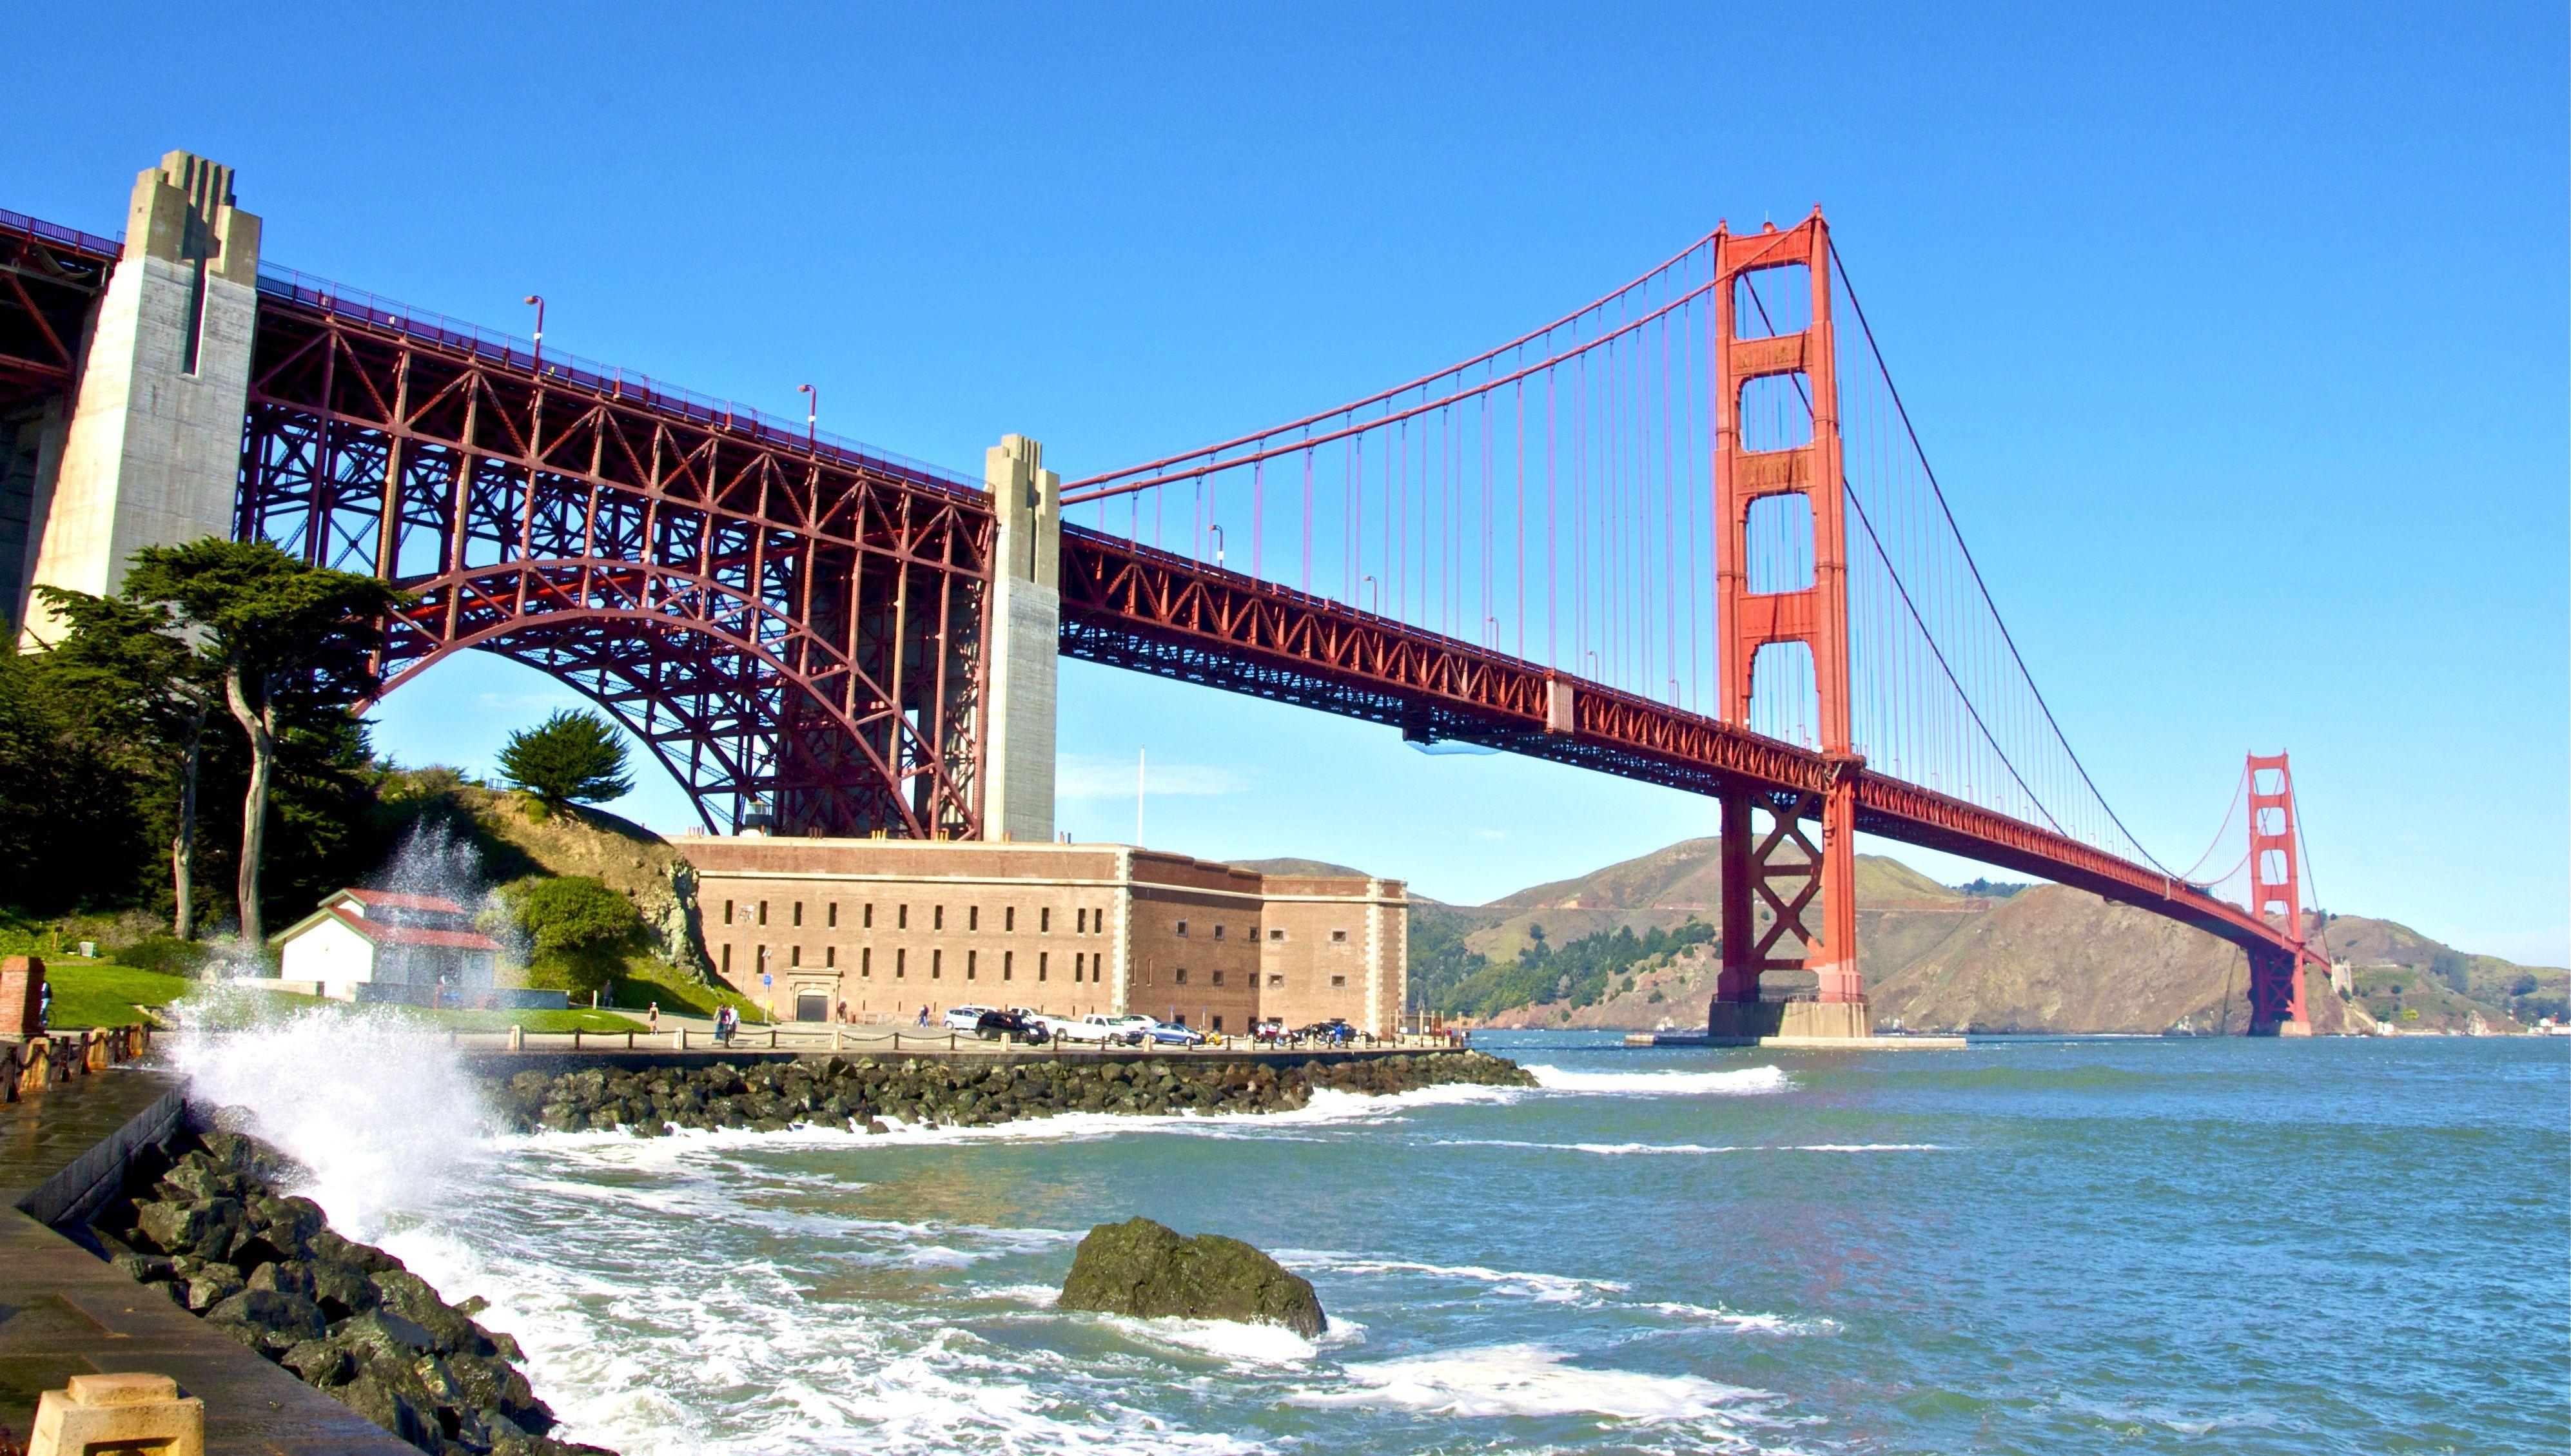 Most Romantic Destinations In San Francisco Tourist Places In California San Francisco Golden Gate Bridge California Tourist Attractions